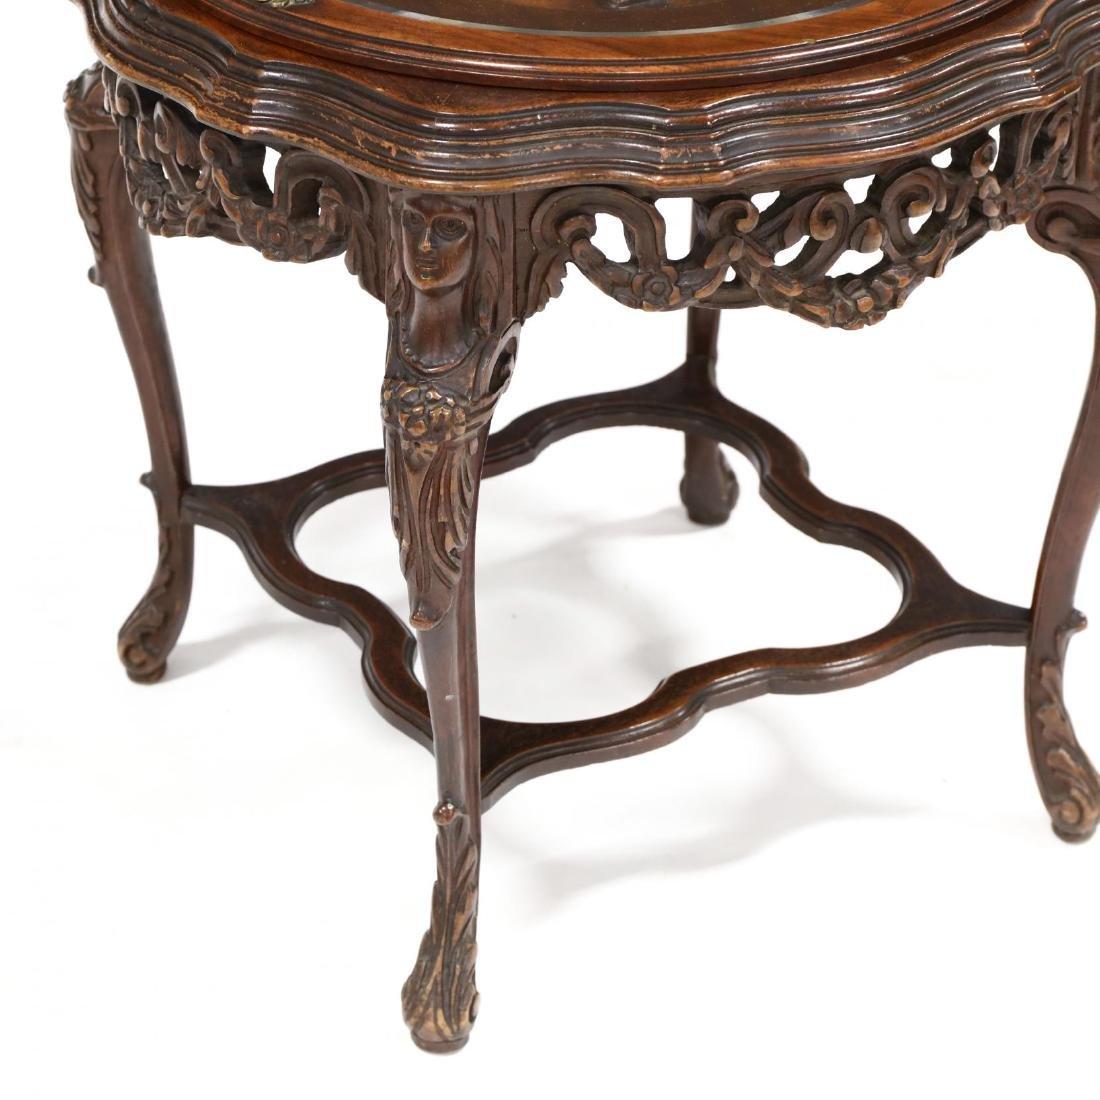 Vintage Italian Carved Walnut Figural Tray Table - 3